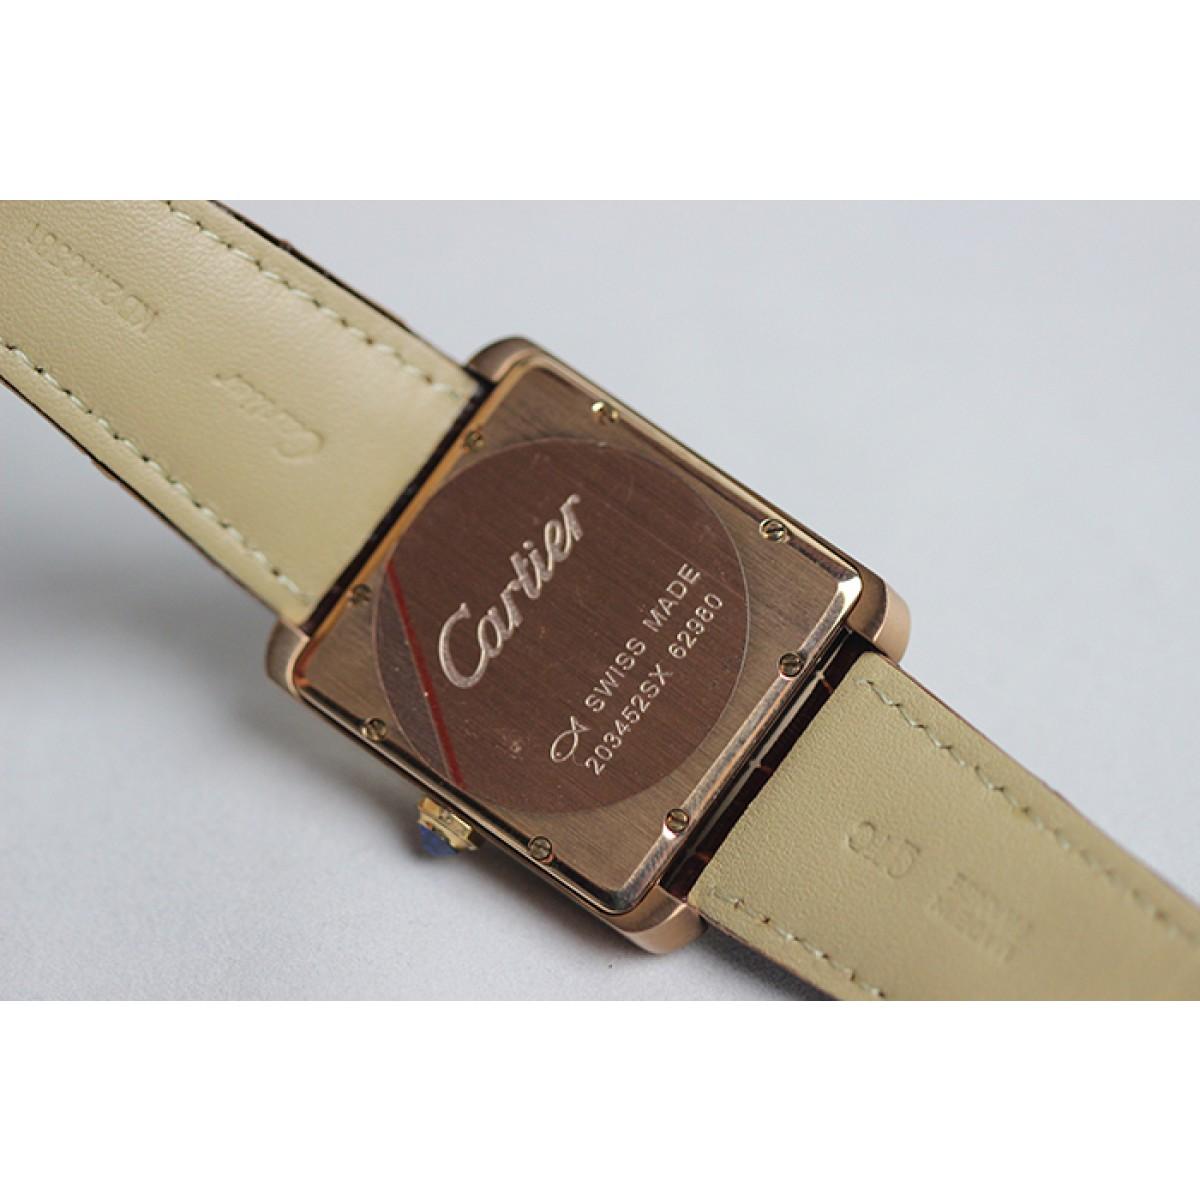 640836db007 Réplica de Relógio Cartier Tank